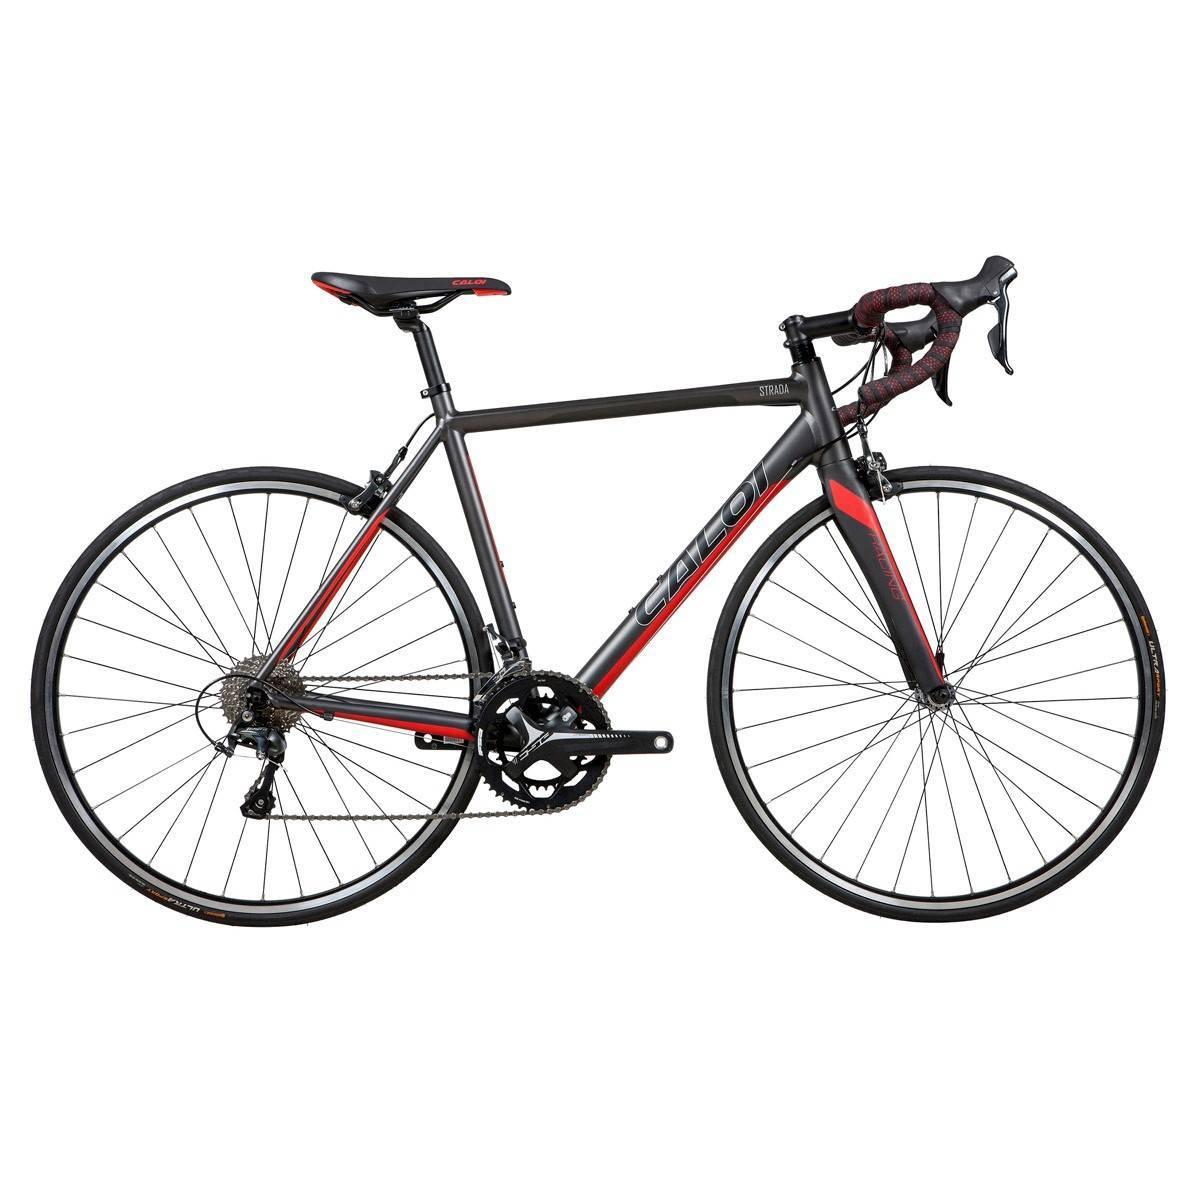 Bicicleta Caloi Strada Racing 2018